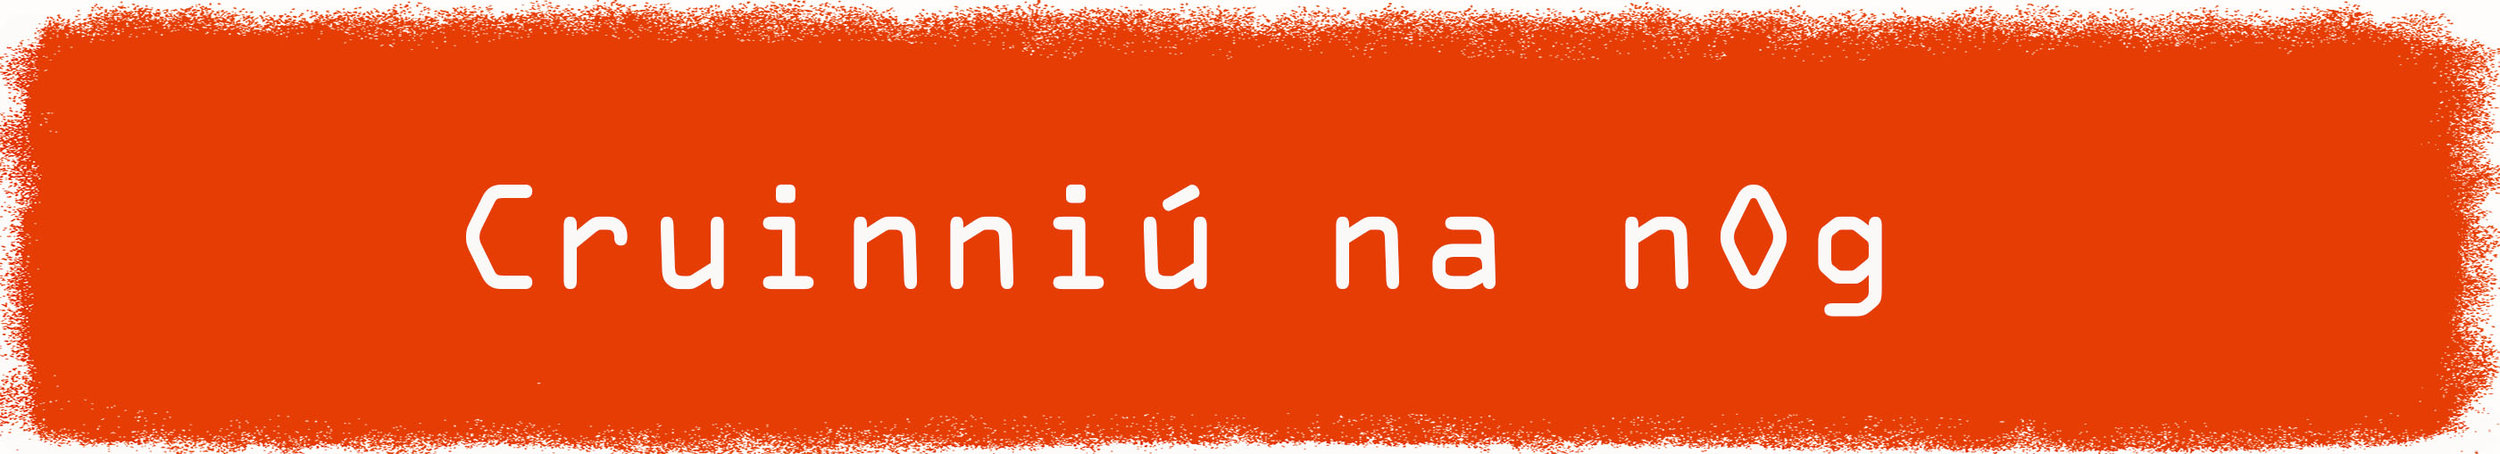 button_orange_cruinniu_na_nog.jpg